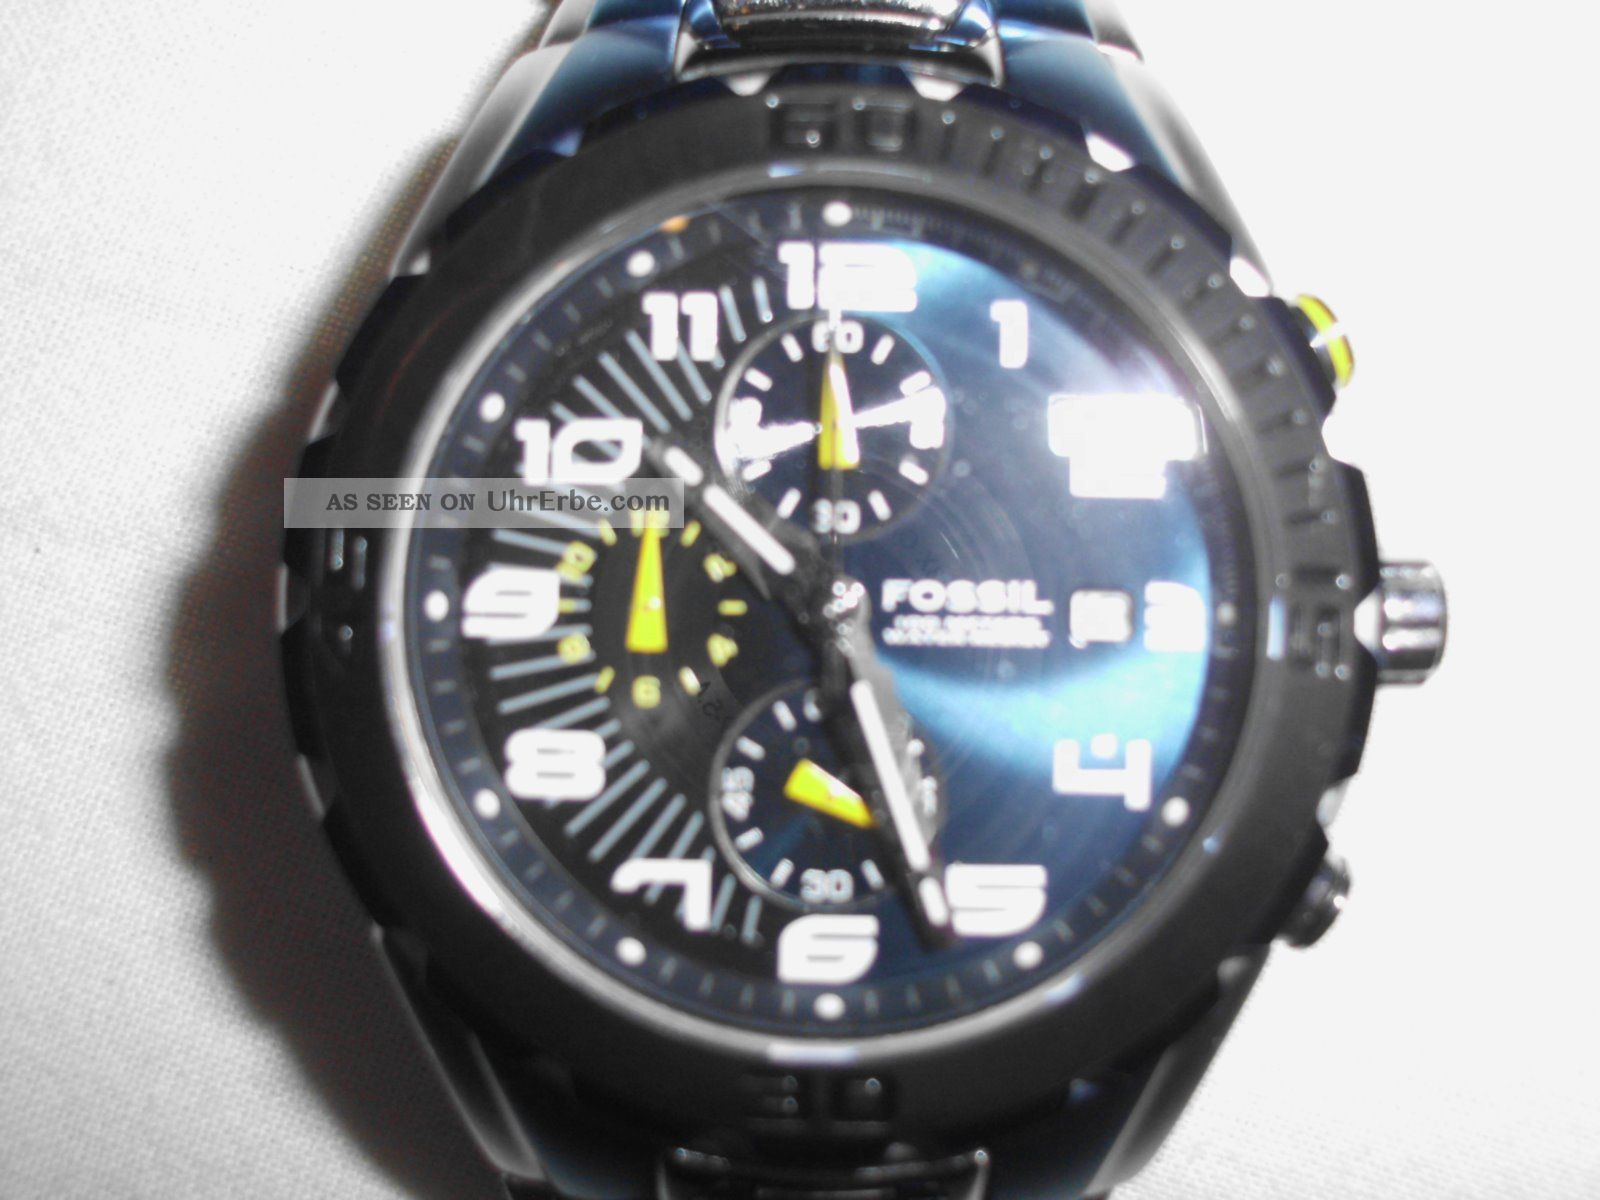 Fossil Blue Ch - 2471 - 340701 Herren Uhr Armbanduhren Bild